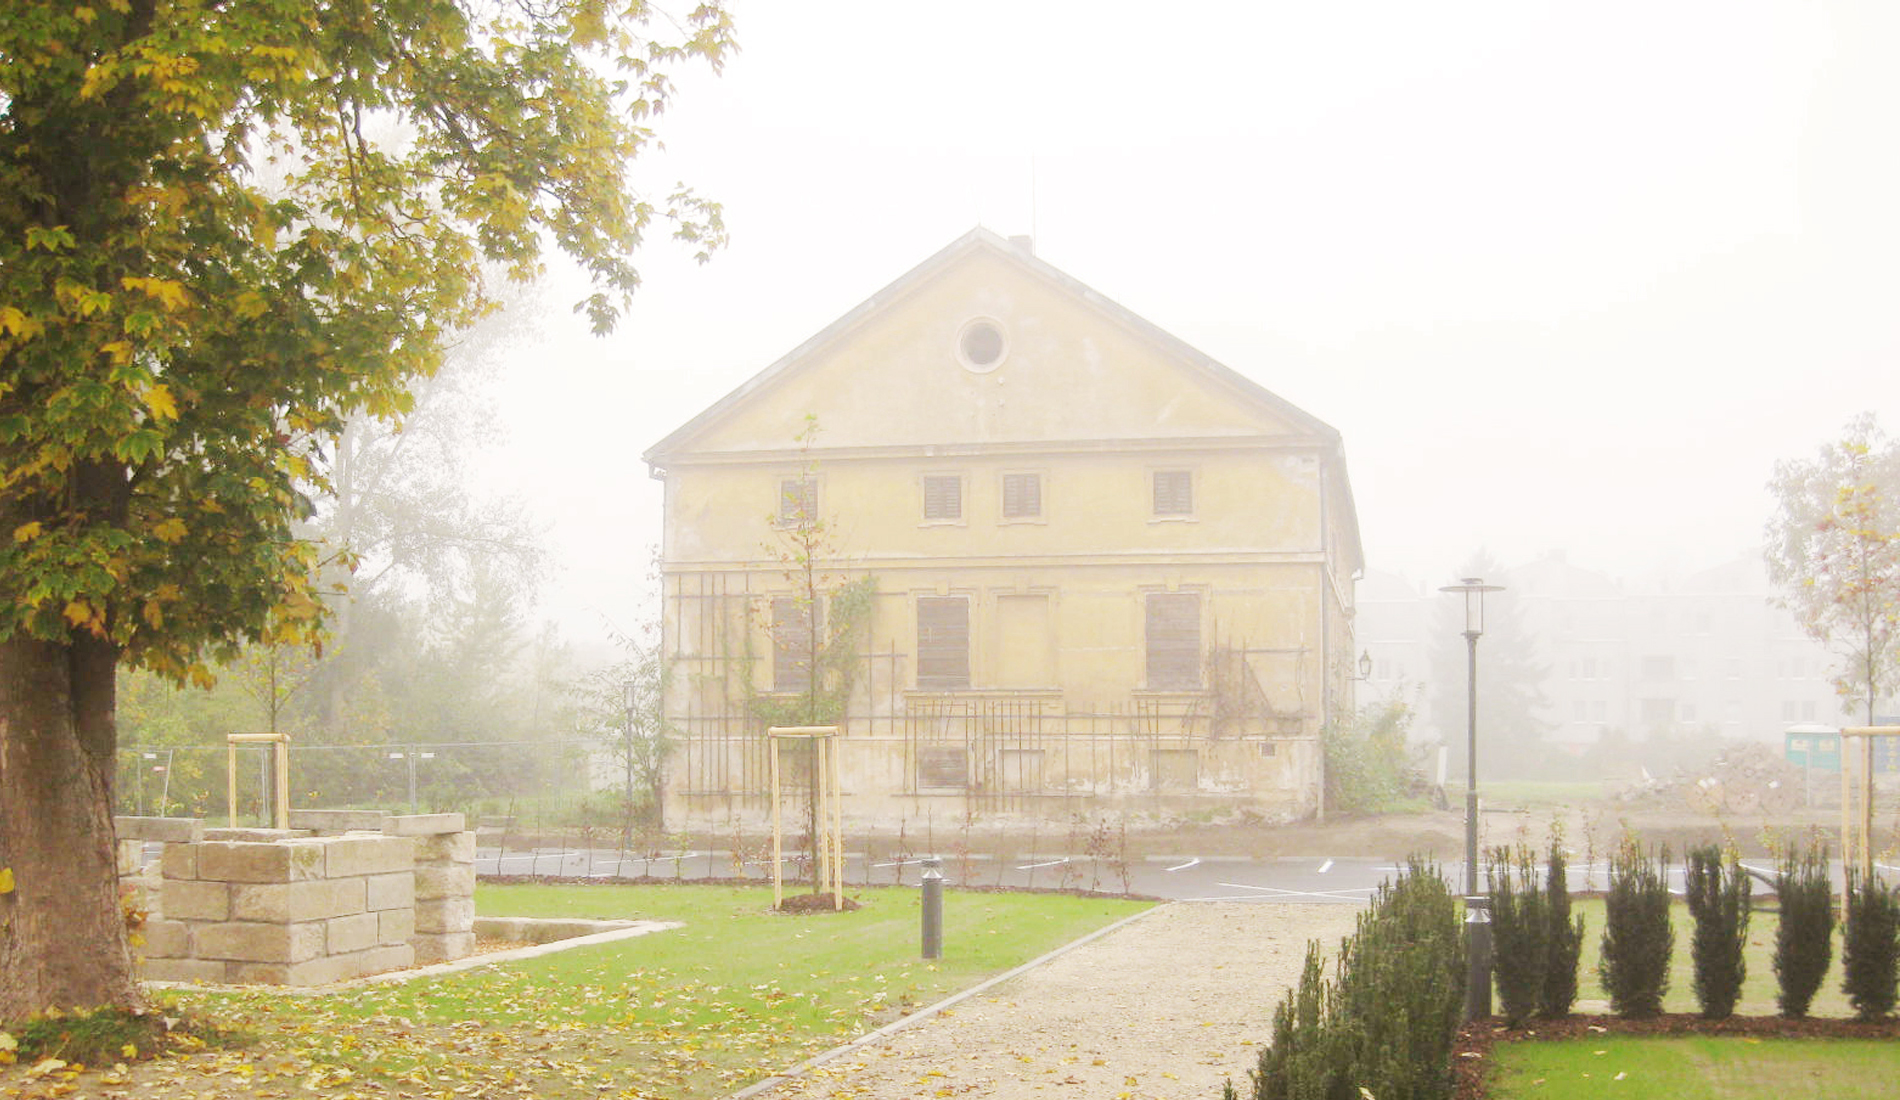 04/Baubeginn_Meierhof_01